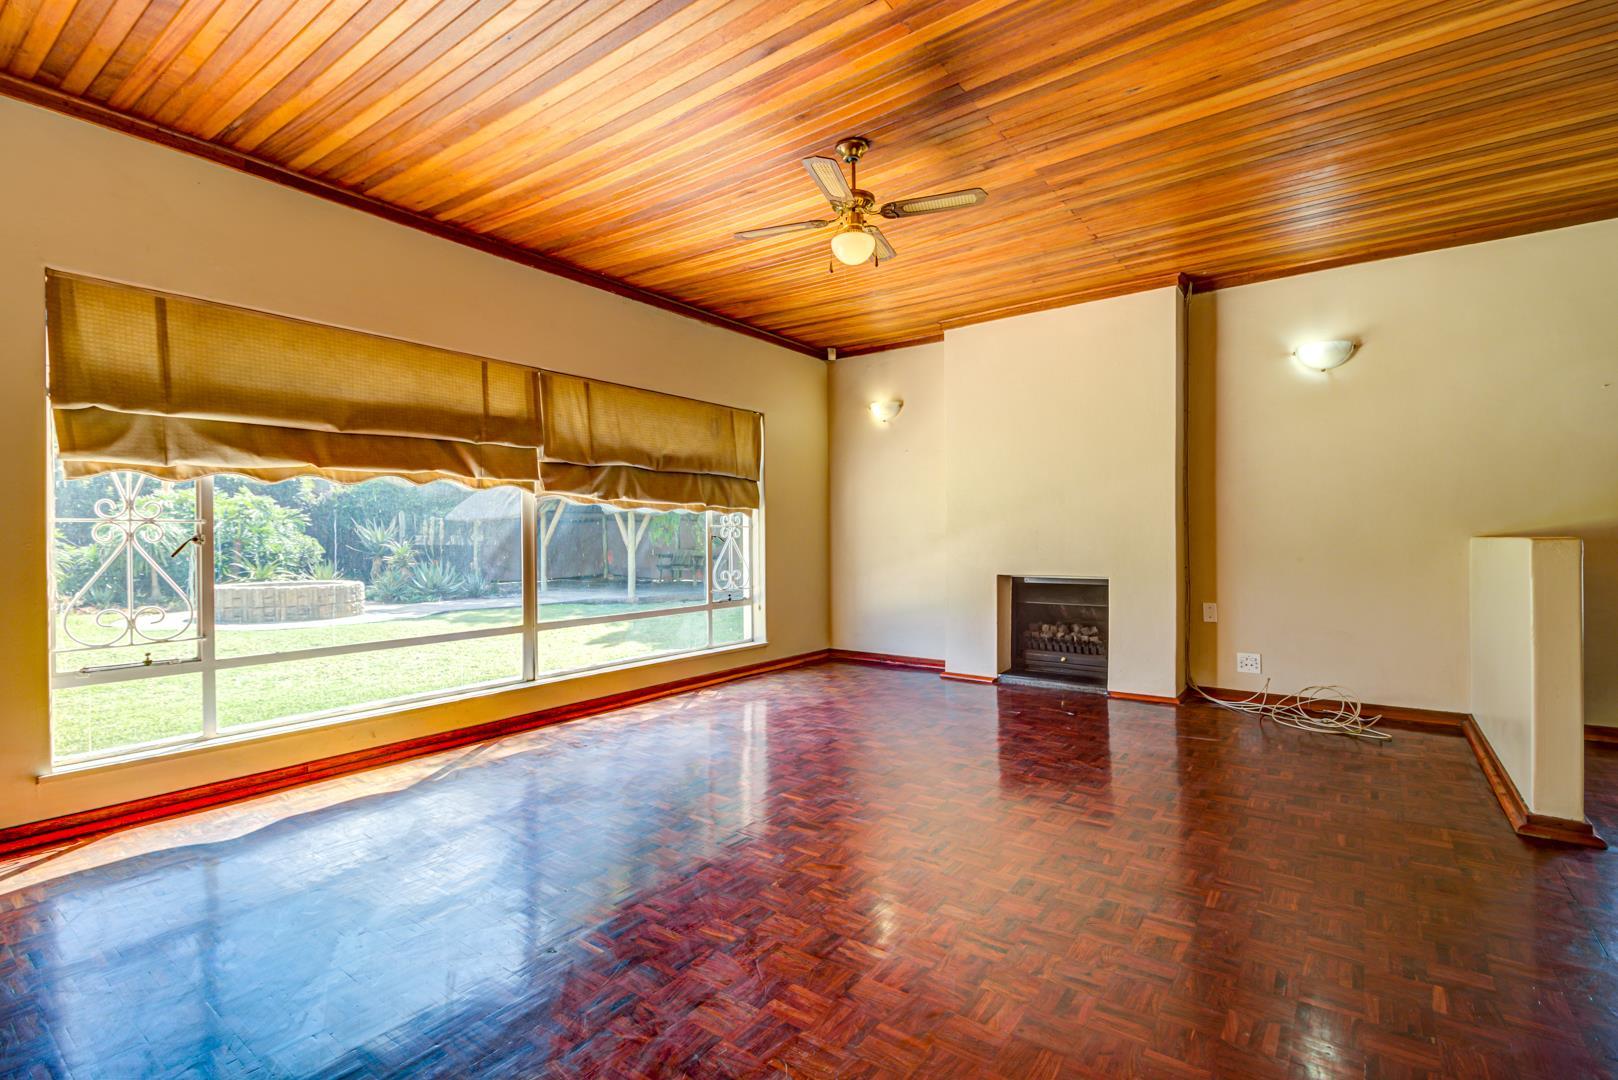 4 Bedroom House For Sale in Terenure